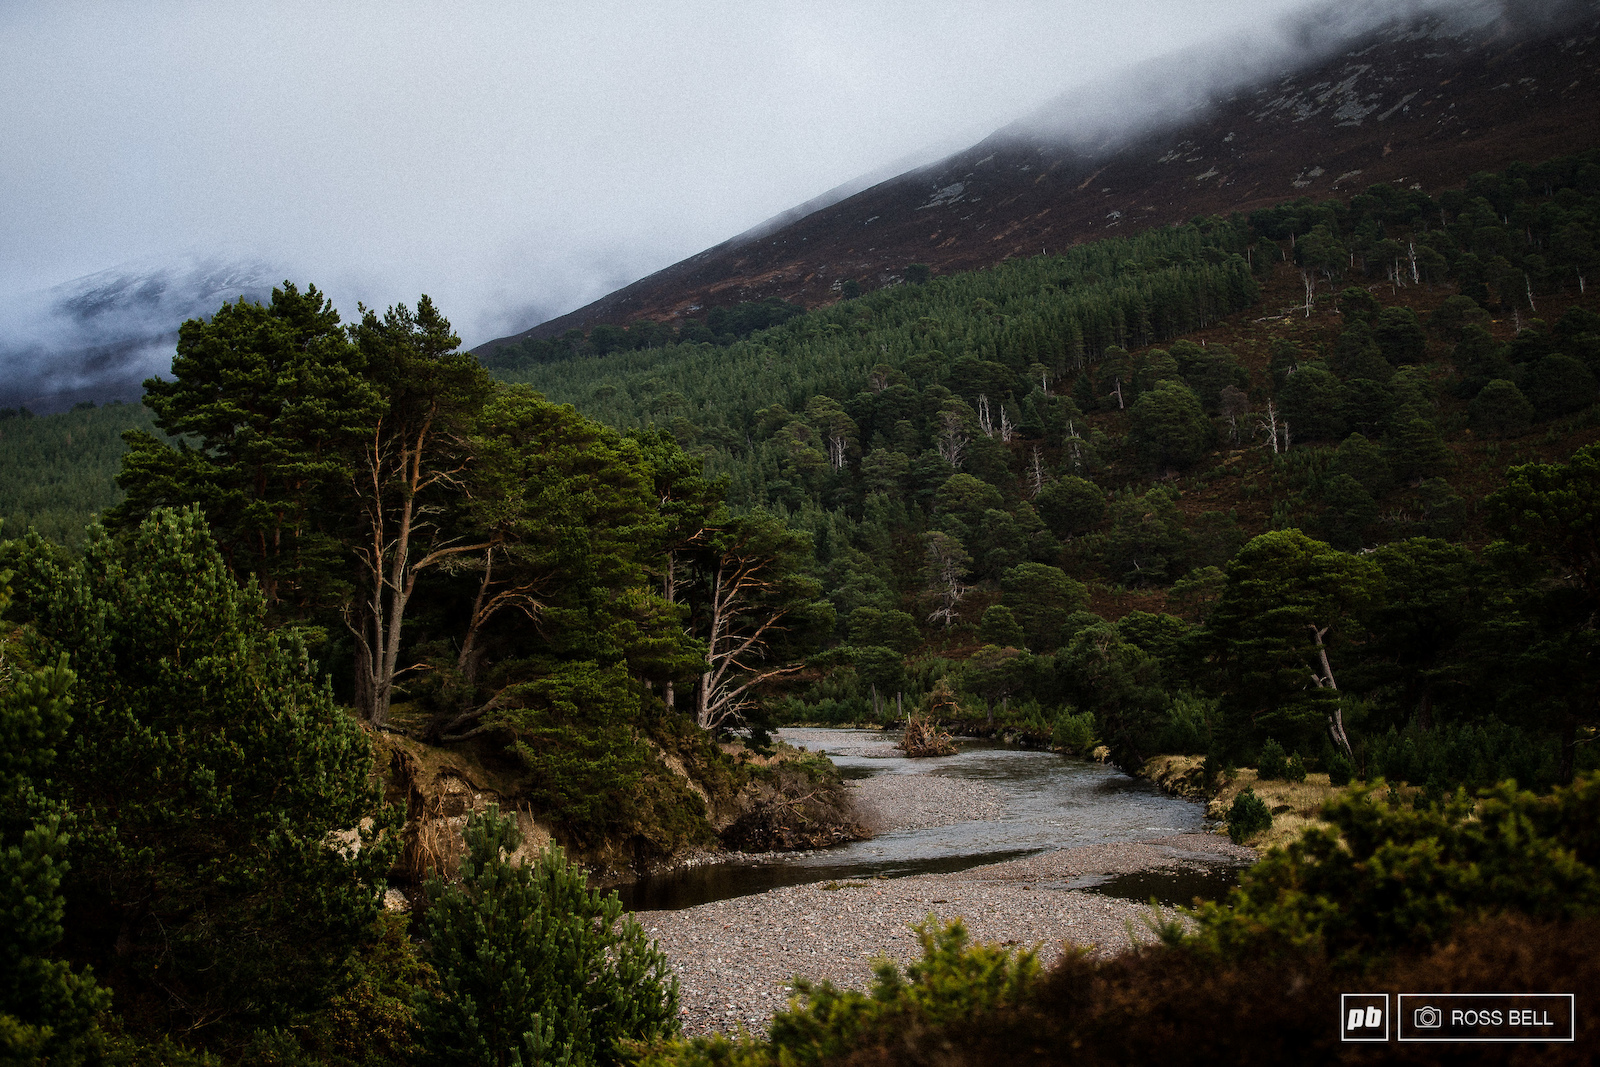 Glen Feshie in the Cairngorms National Park Scotland.